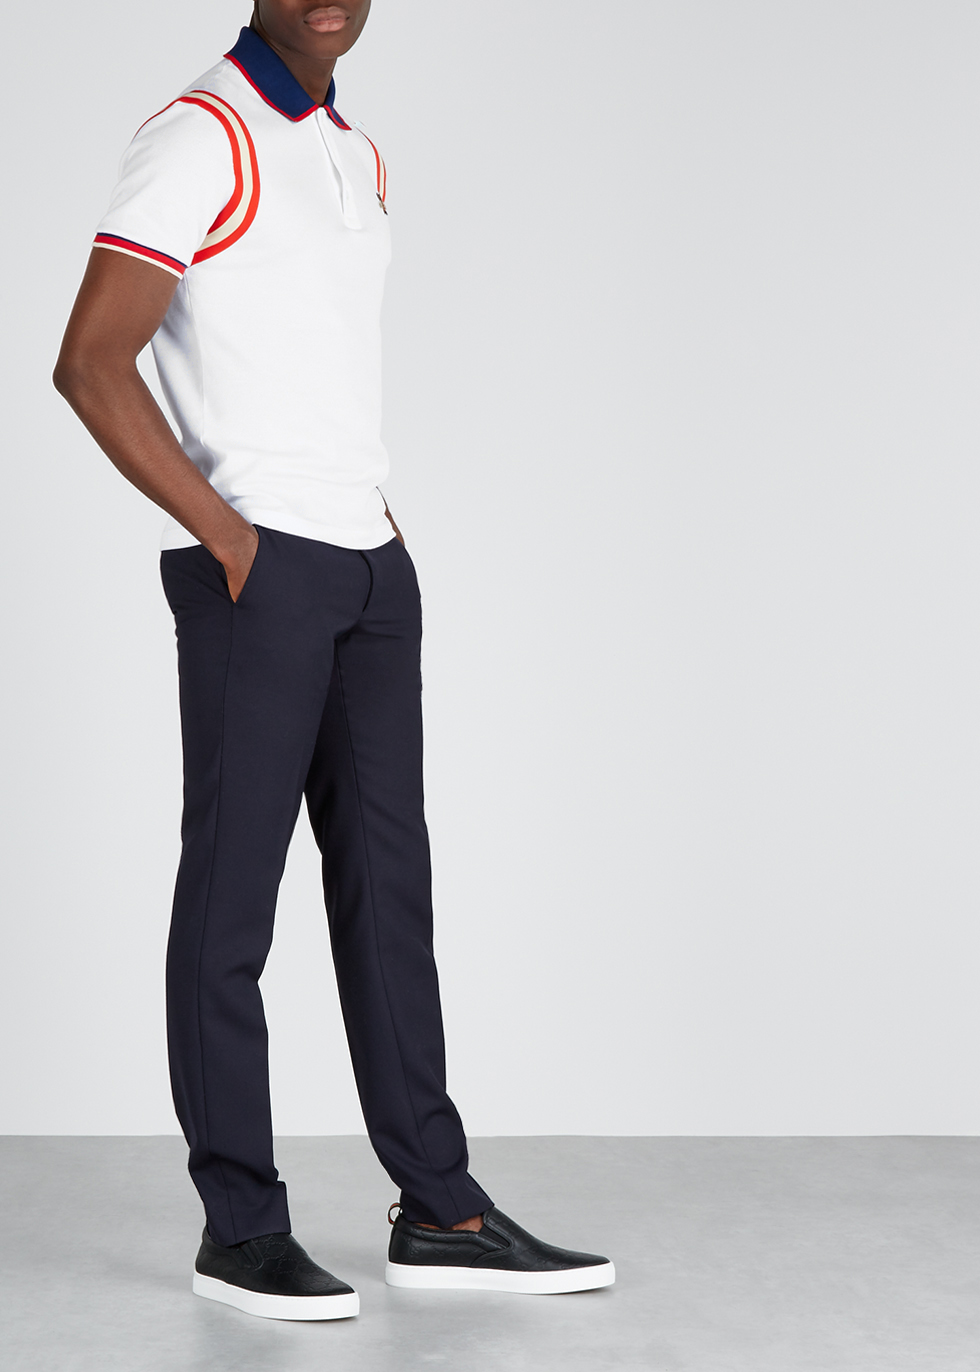 7b575300 Men's Designer Polo Shirts - Harvey Nichols